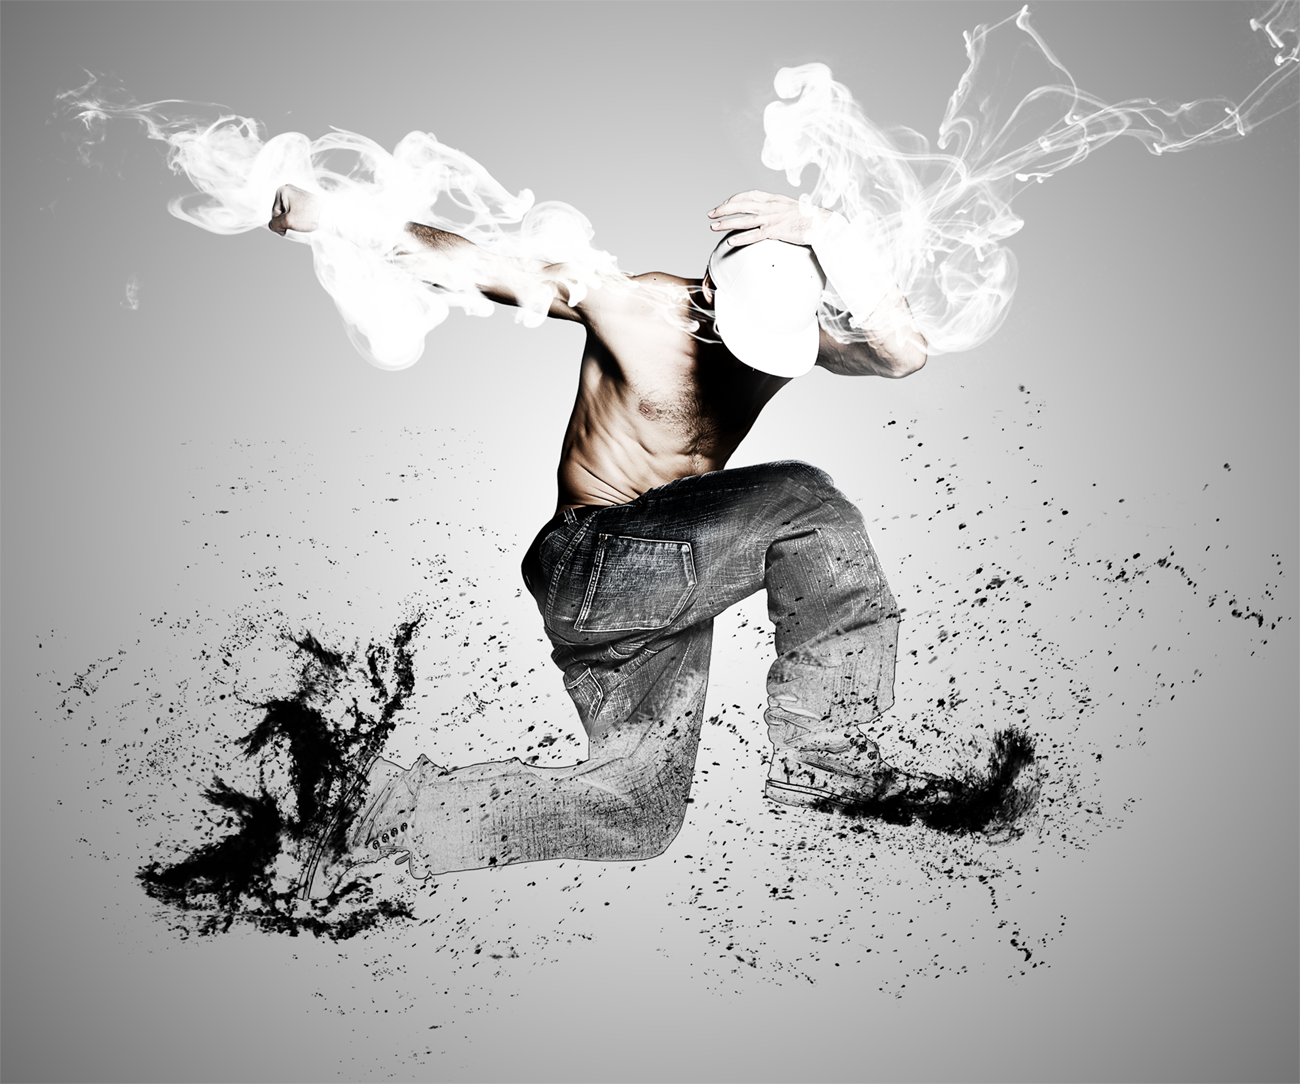 dancer shaz london art athlete love photography jump twist paint